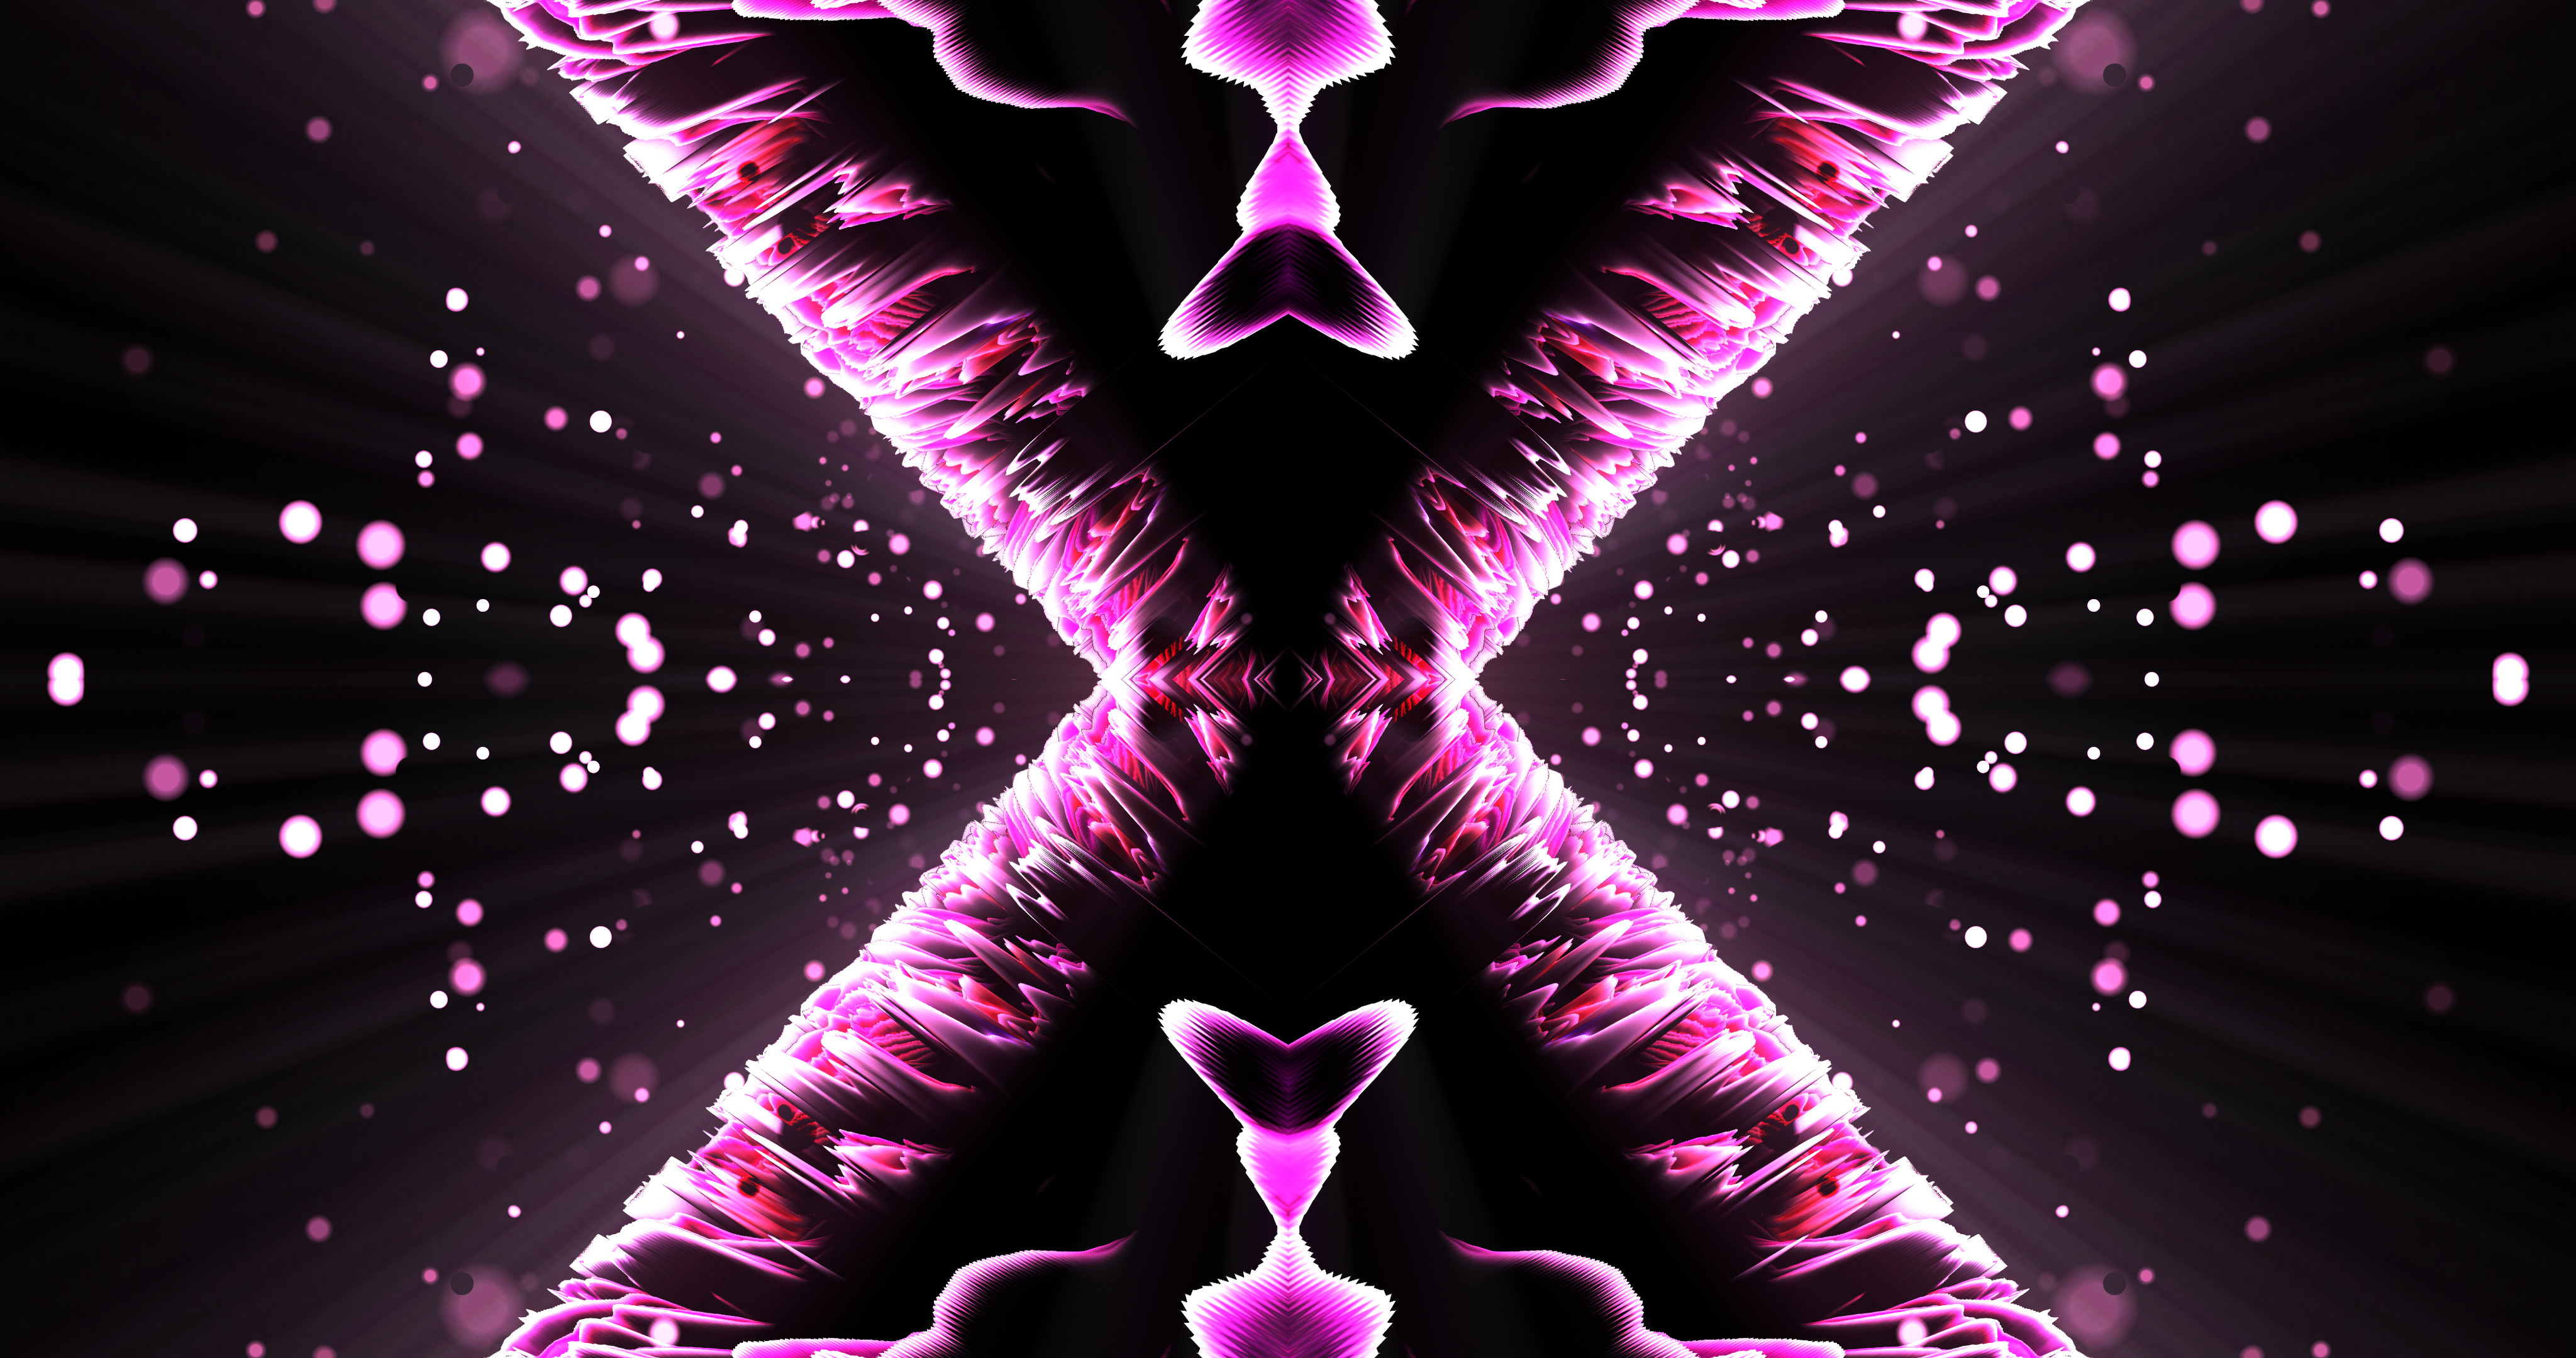 FREE pinkBURST 4K Wallpaper by XxStryveRxX